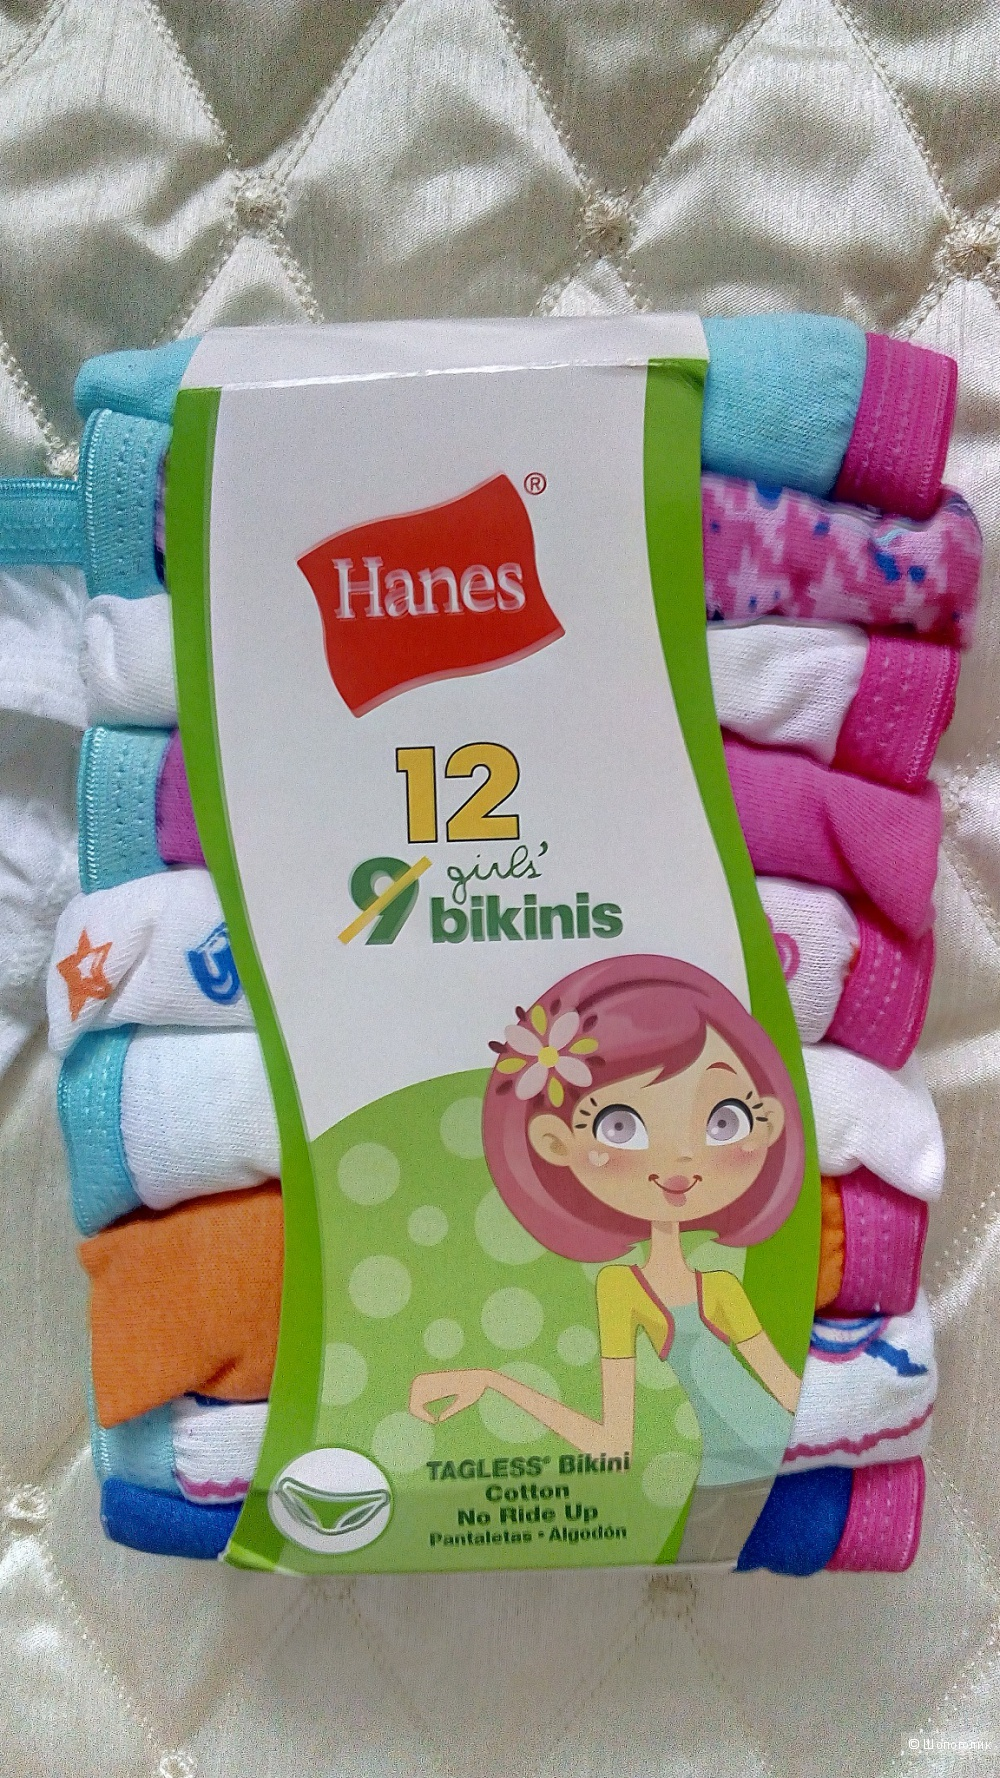 Трусики Hanes, размер 5-7 лет